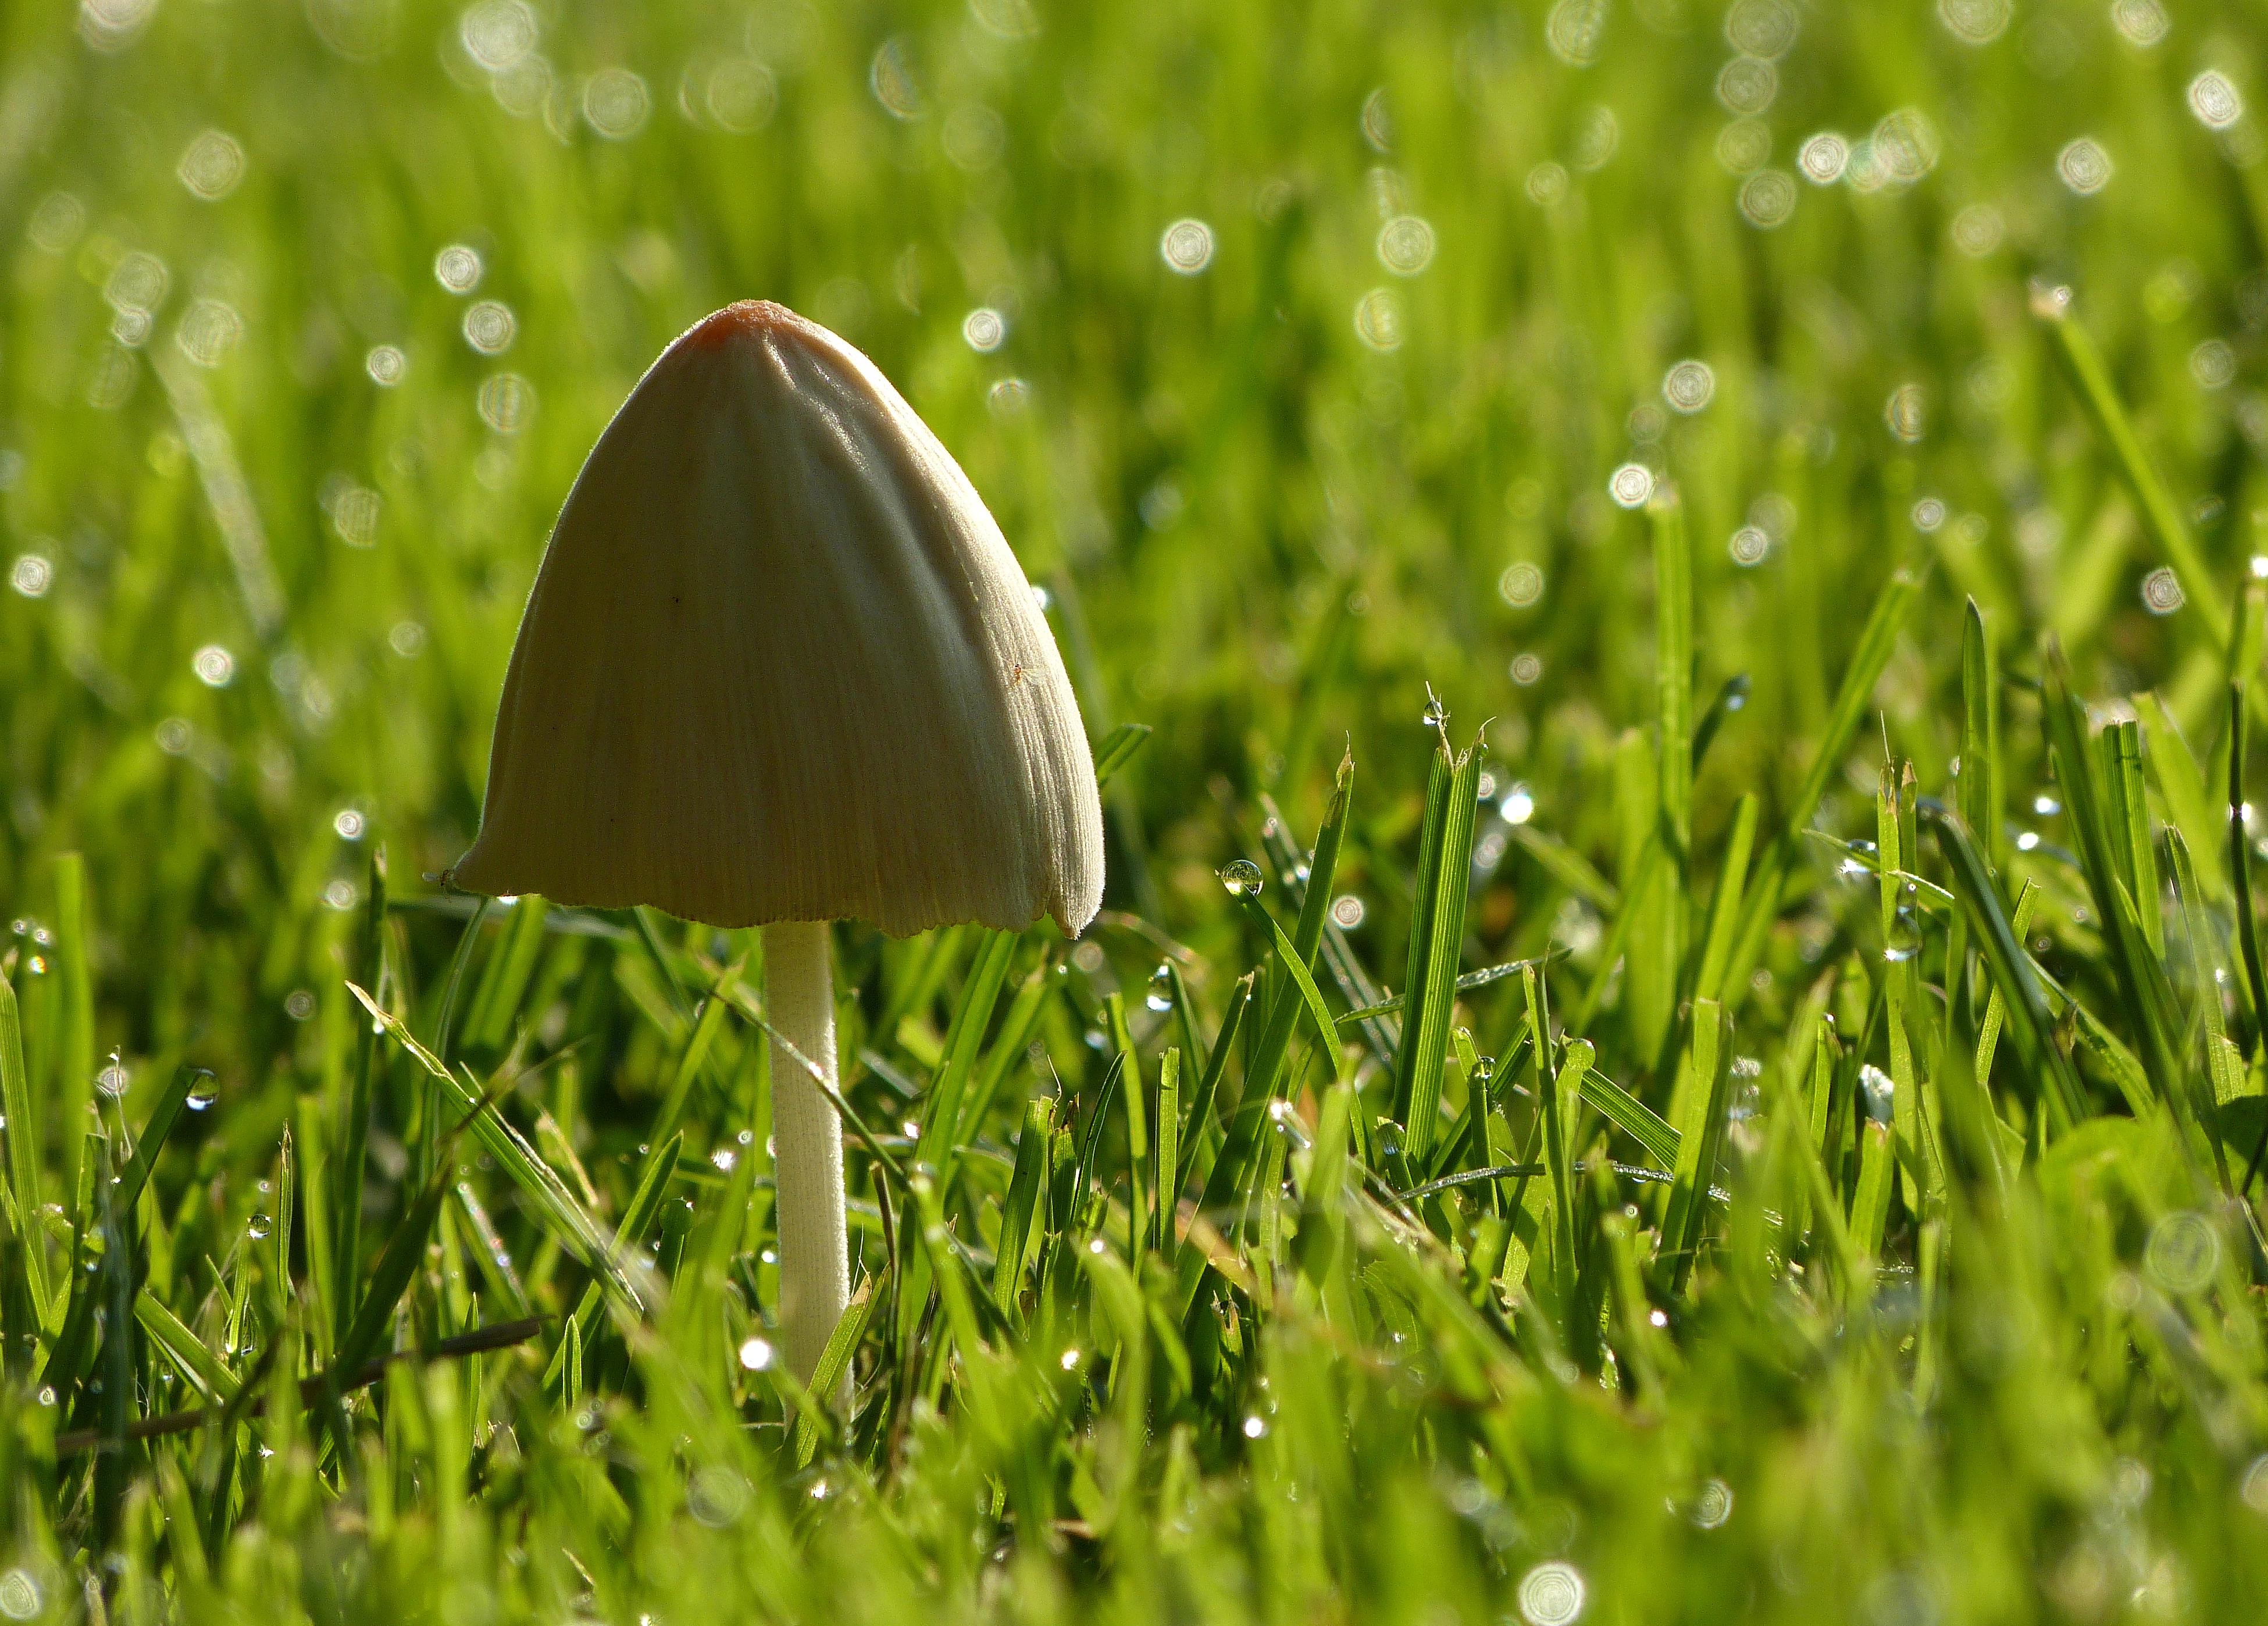 Wallpaper Mushroom Garden Droplets Drops Fungi Dew Toadstool Tuin Paddenstoel Dauw Paddestoel Druppels Panasonicdmcfz150 1170667 3900x2796 929121 Hd Wallpapers Wallhere